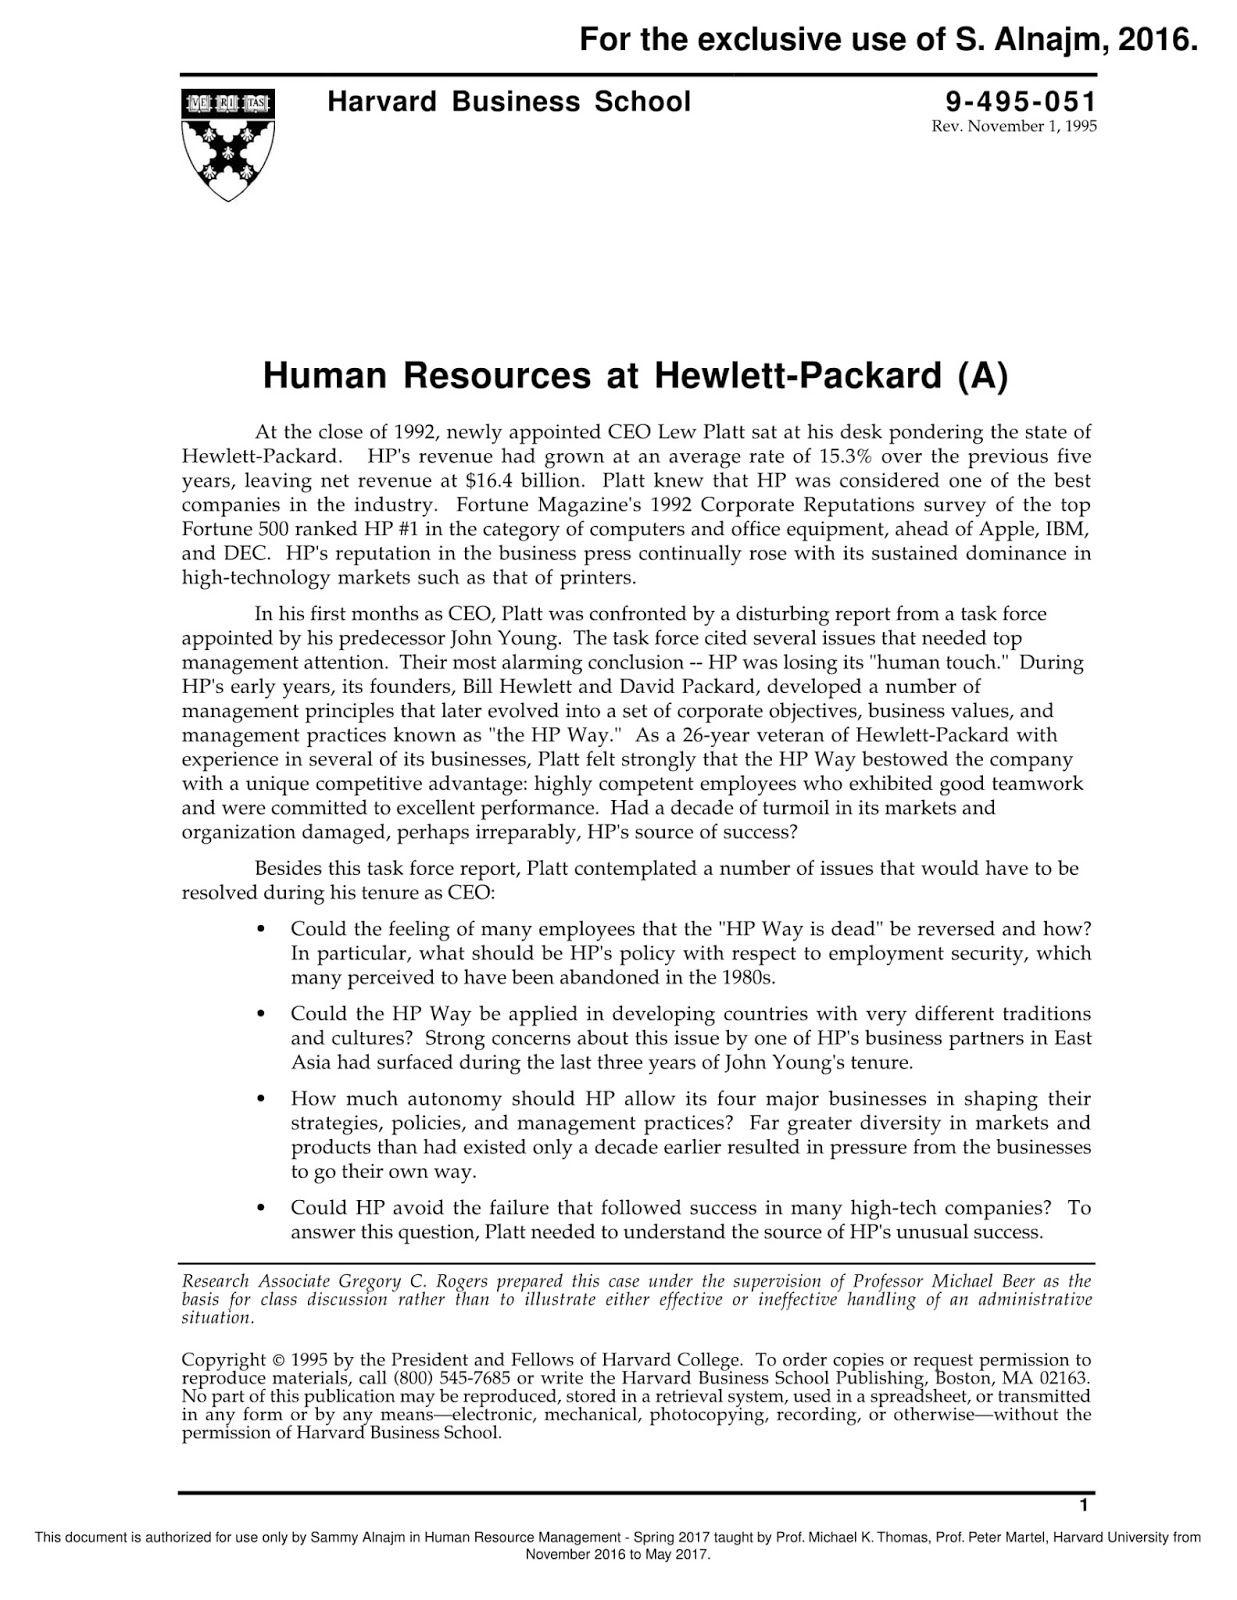 Hewlett Packard Case Sample  Case Study Sample Paper  Hewlett